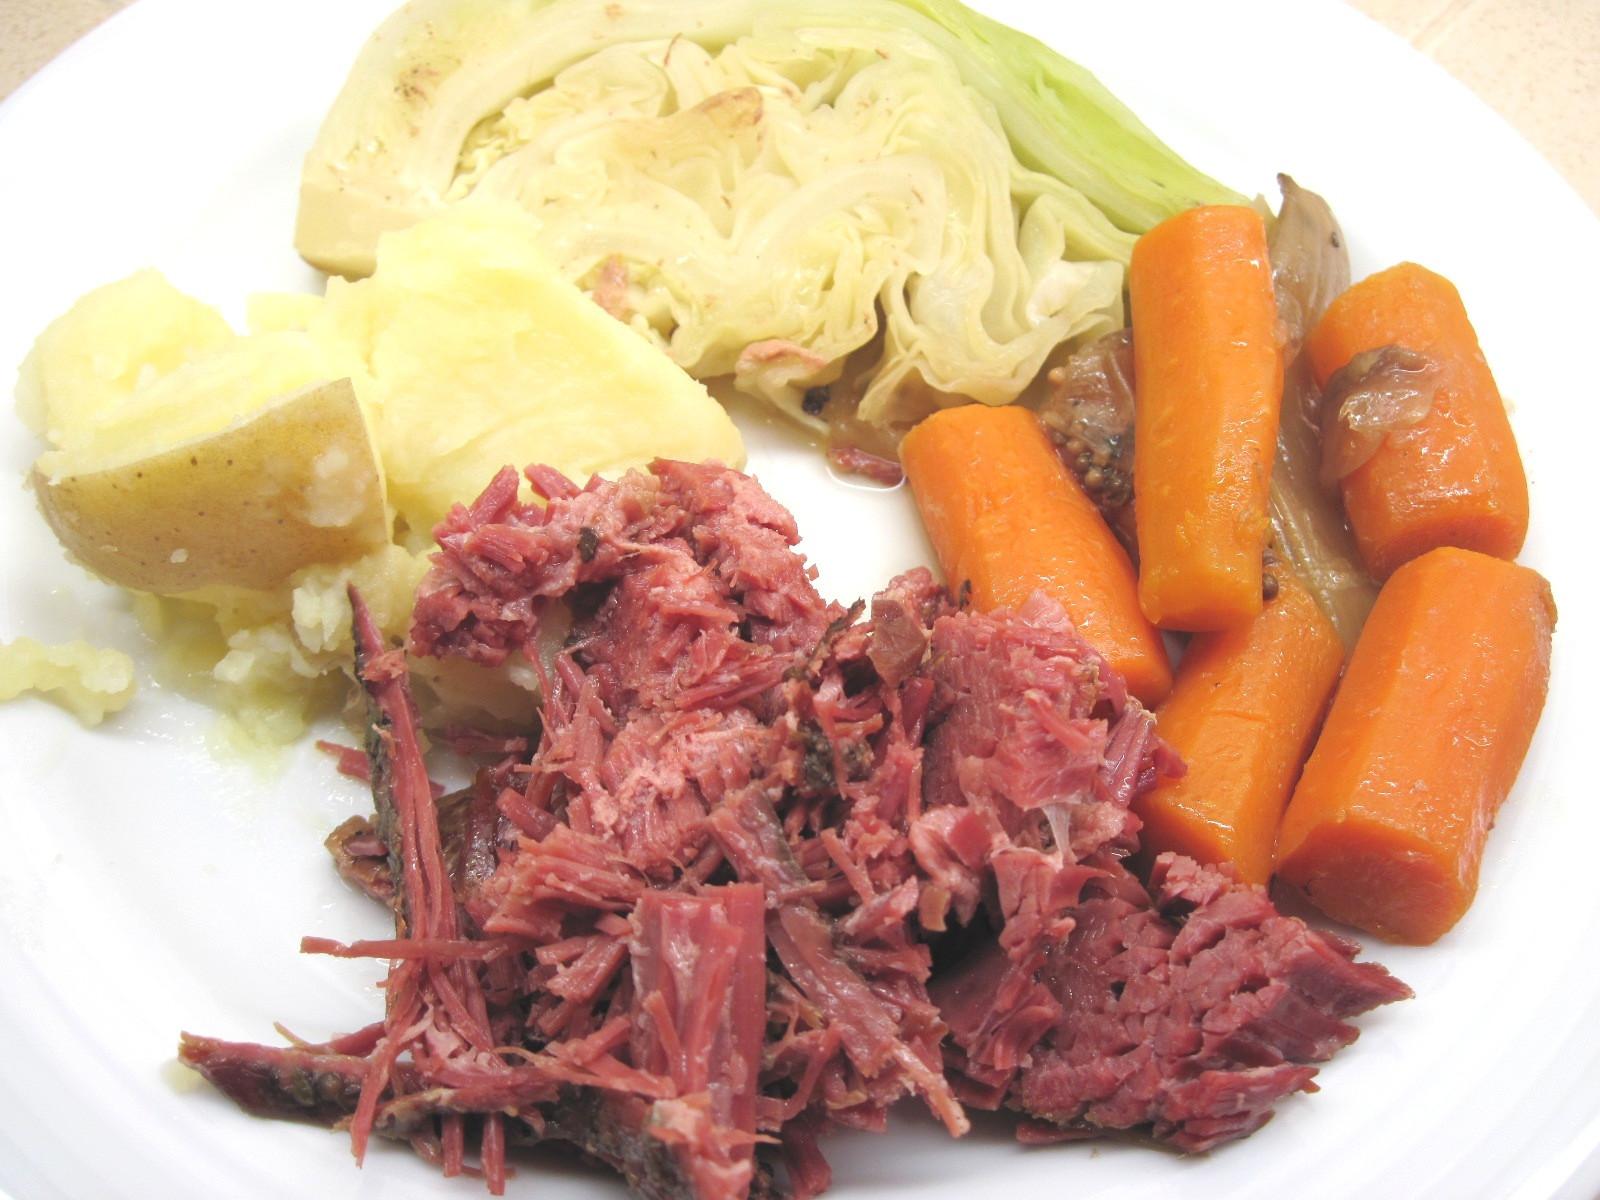 St Patricks Day Dinner  St Patrick's Day Corned Beef Dinner